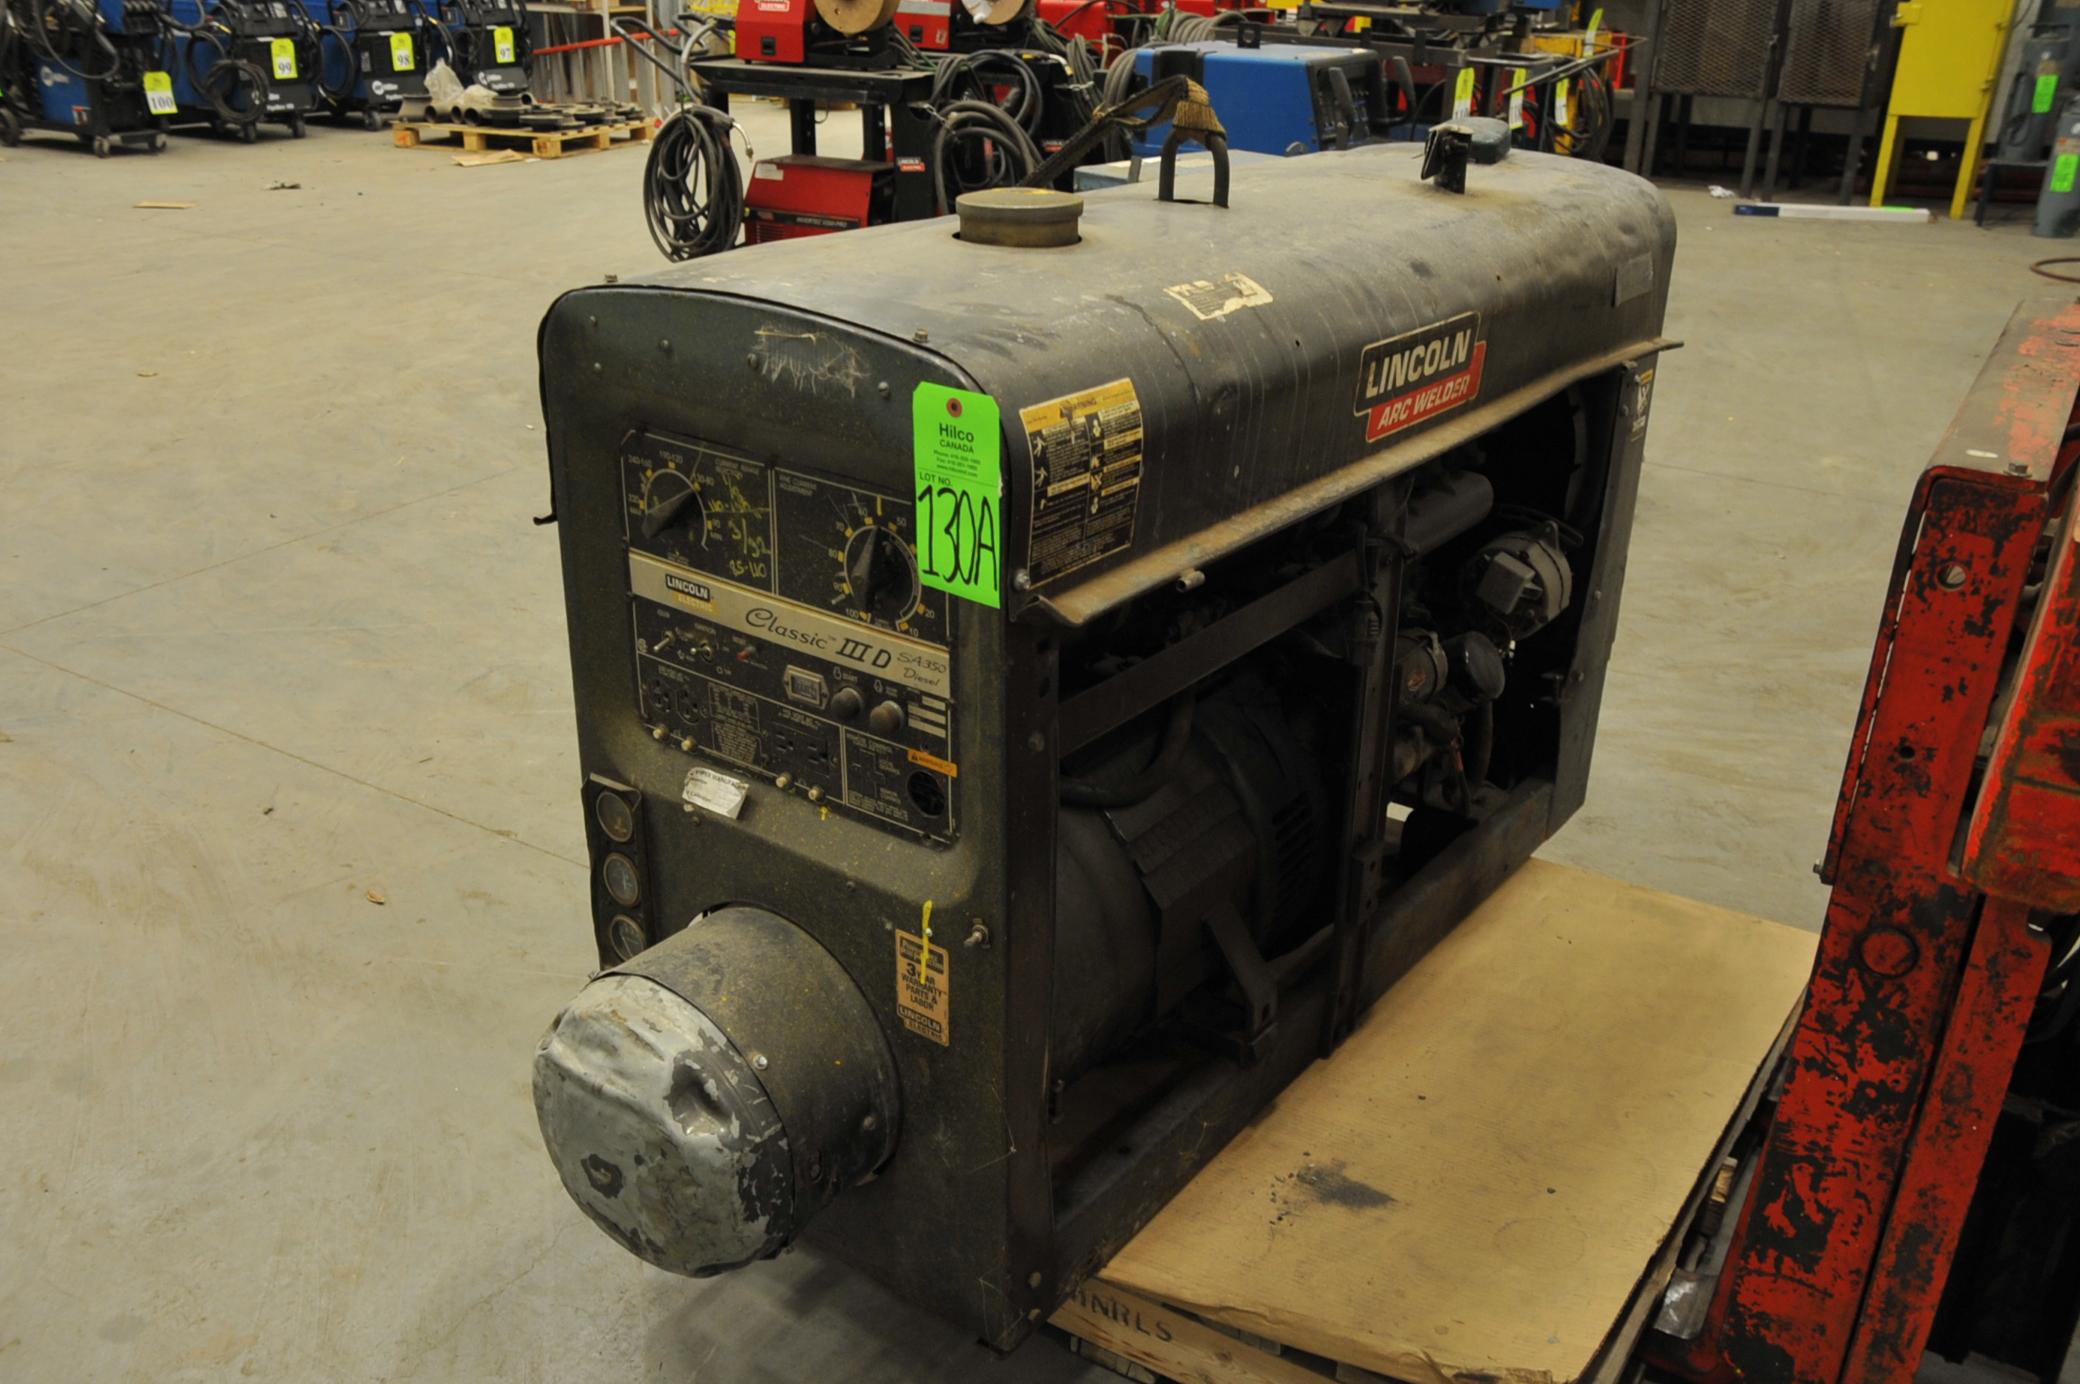 Lincoln Model TMD 27 Class 3 D SA 350 Diesel Welder Generator